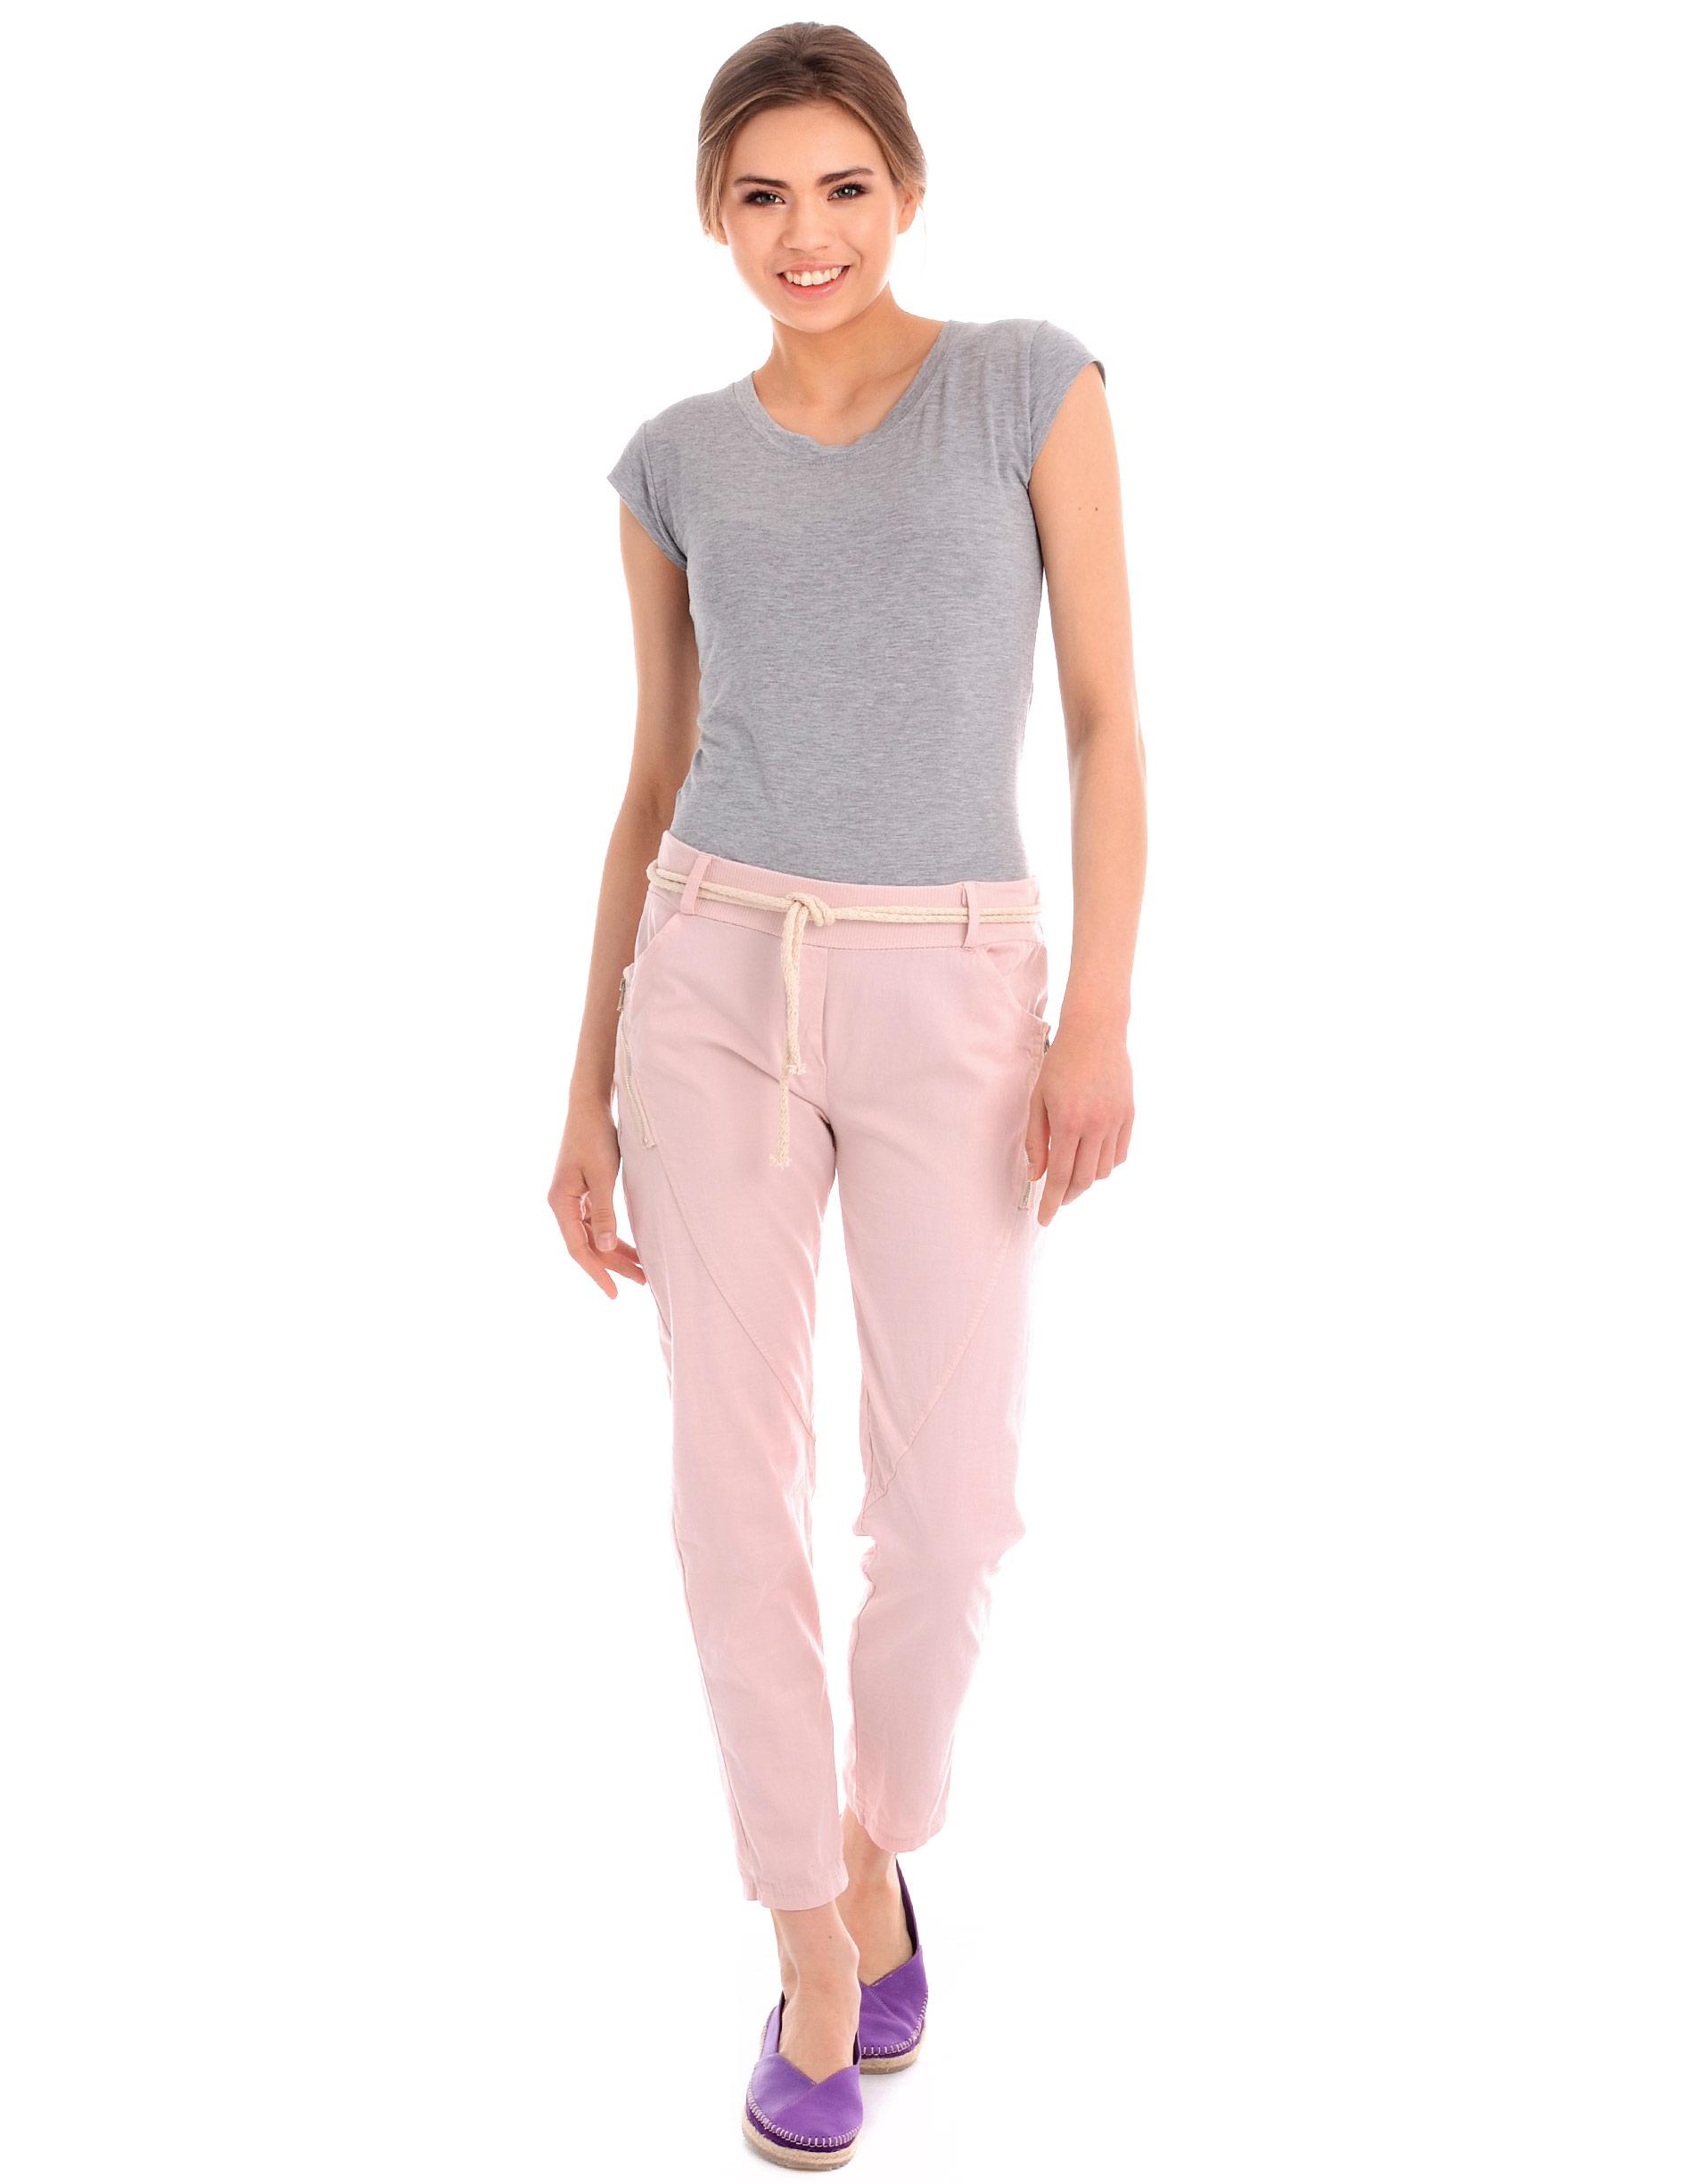 Spodnie - 106-6058 ROSA - Unisono